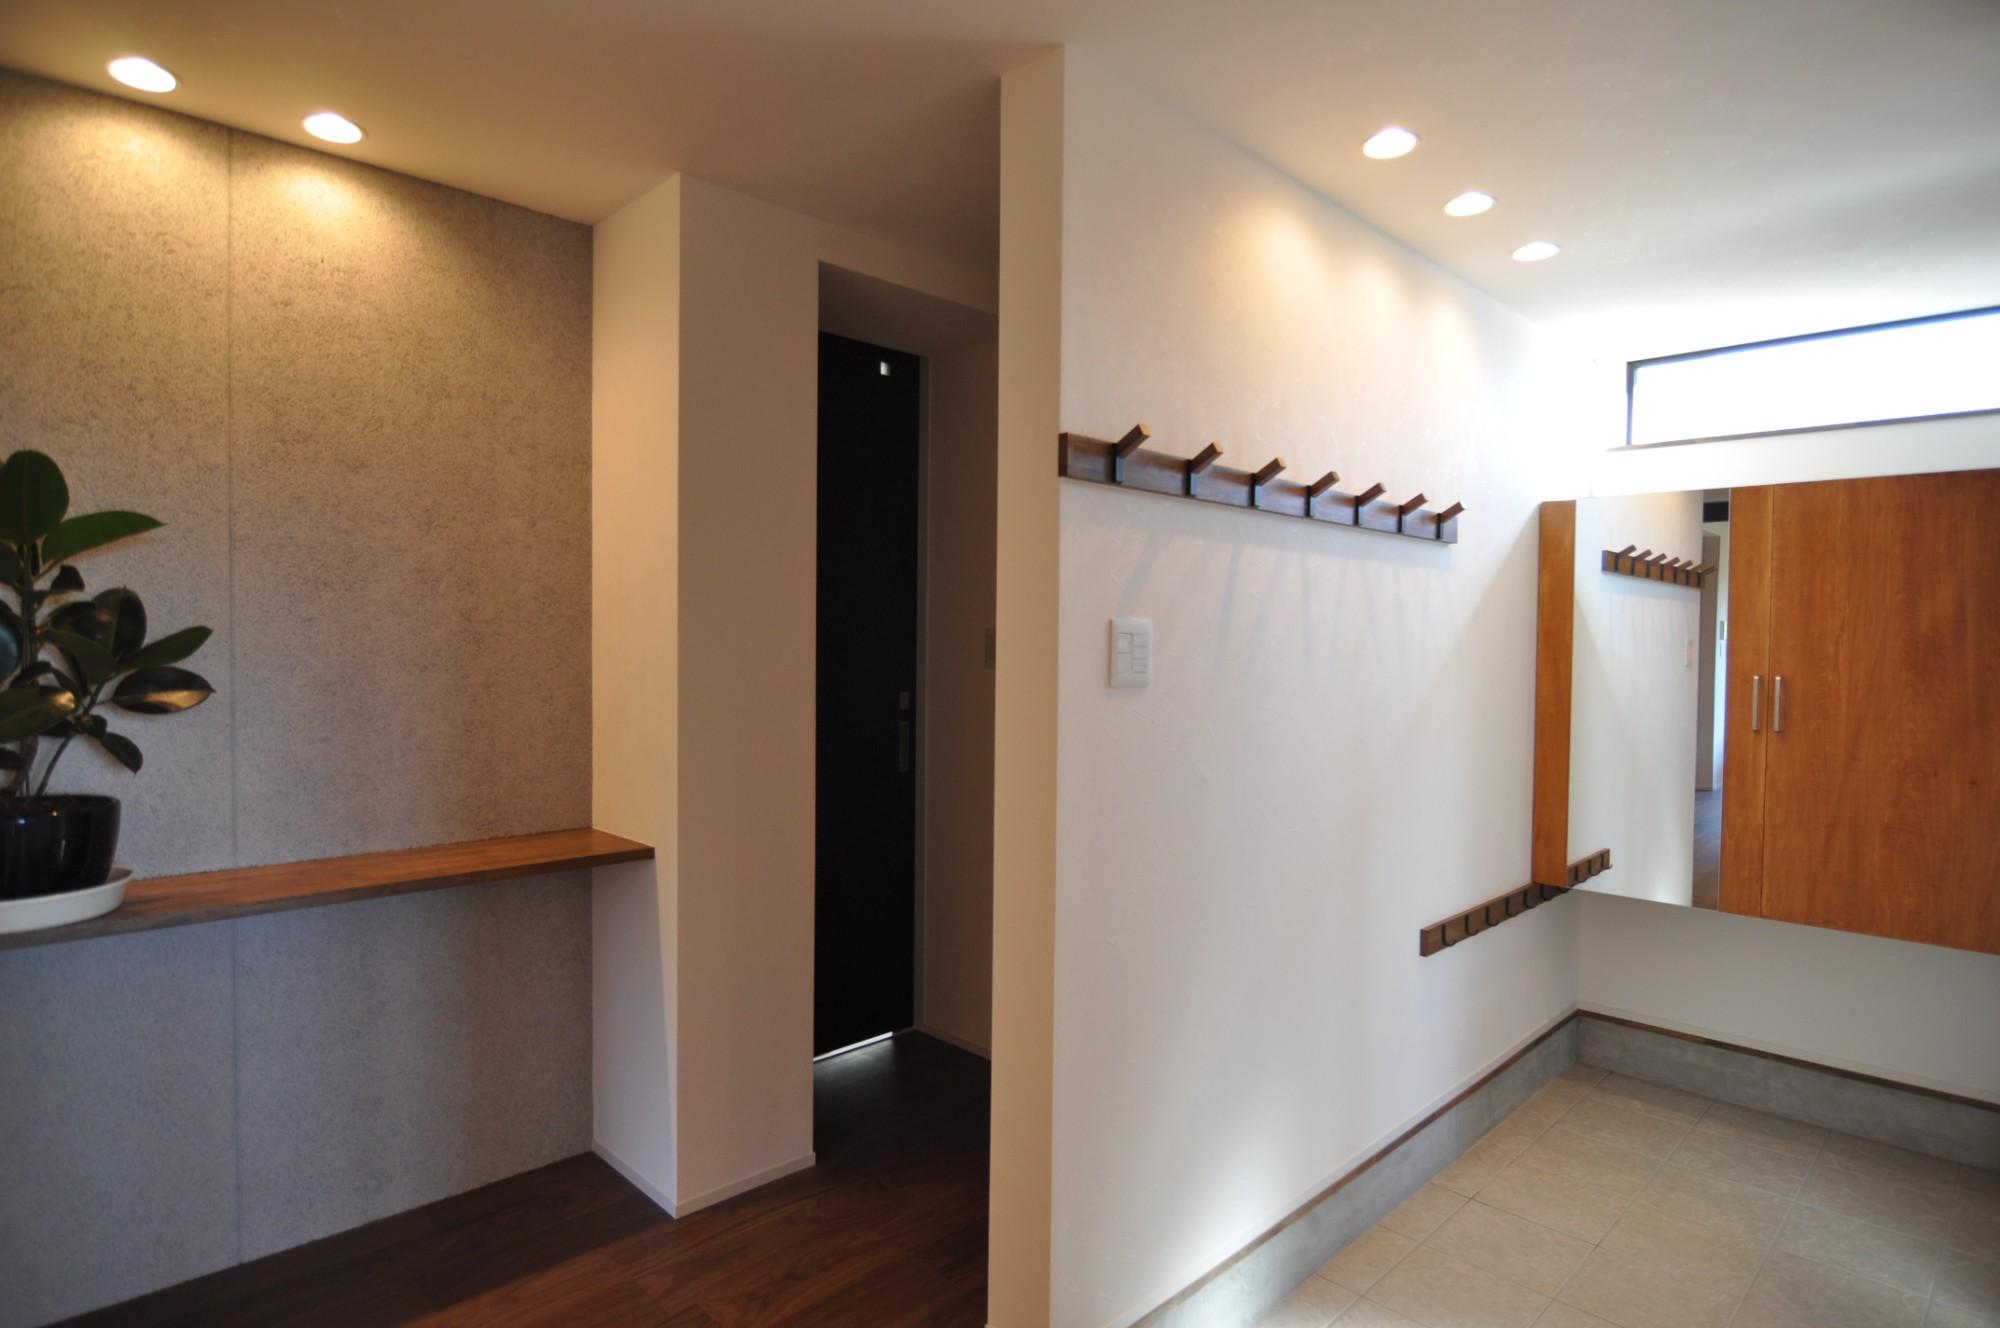 有限会社 市川建築店 1級建築士事務所「三条市 O様邸」のモダンな玄関の実例写真